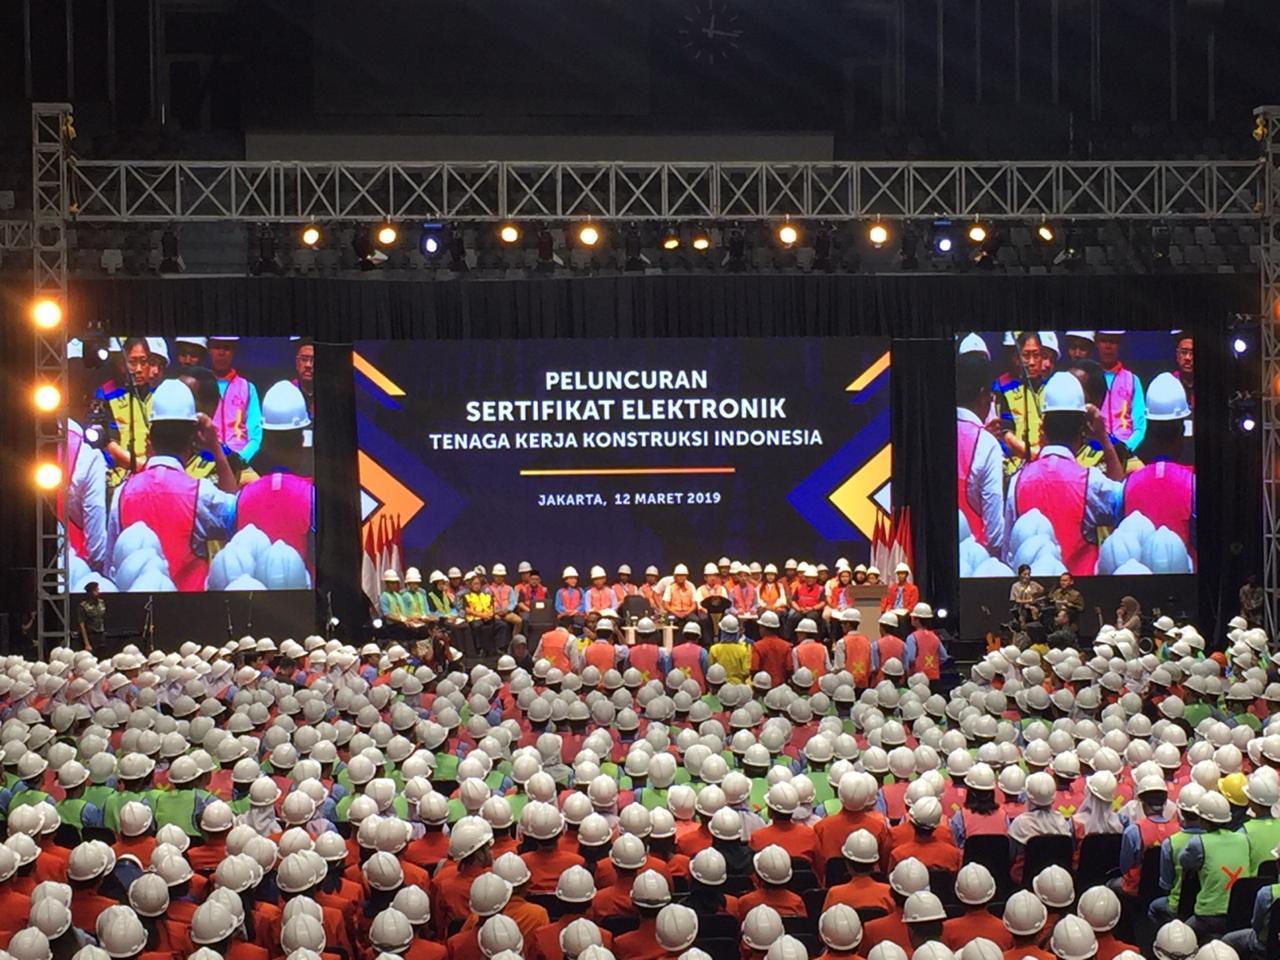 https: img-z.okeinfo.net content 2019 03 12 470 2028879 bahagianya-presiden-jokowi-bagikan-16-000-sertifikat-tenaga-kerja-konstruksi-tLH8pGMA46.jpg